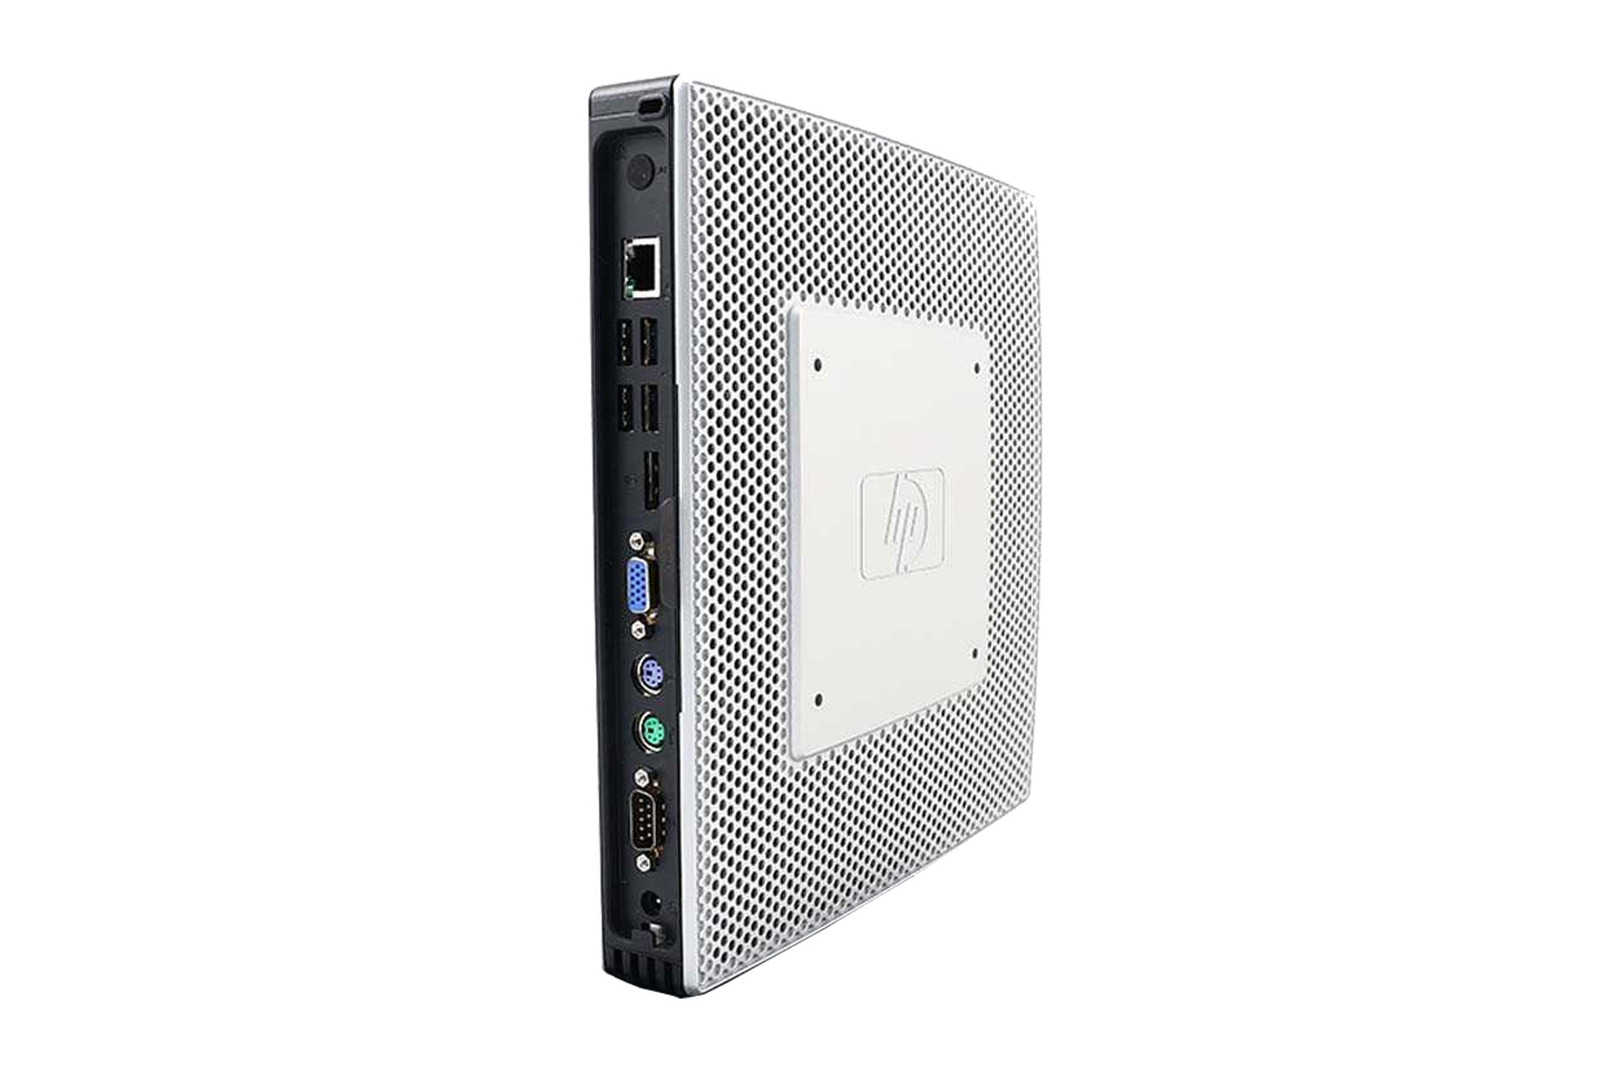 Cloud Clients HP Flexible Thin Client T5745 Intel Atom N280 1GB/1GB ThinPro LAN